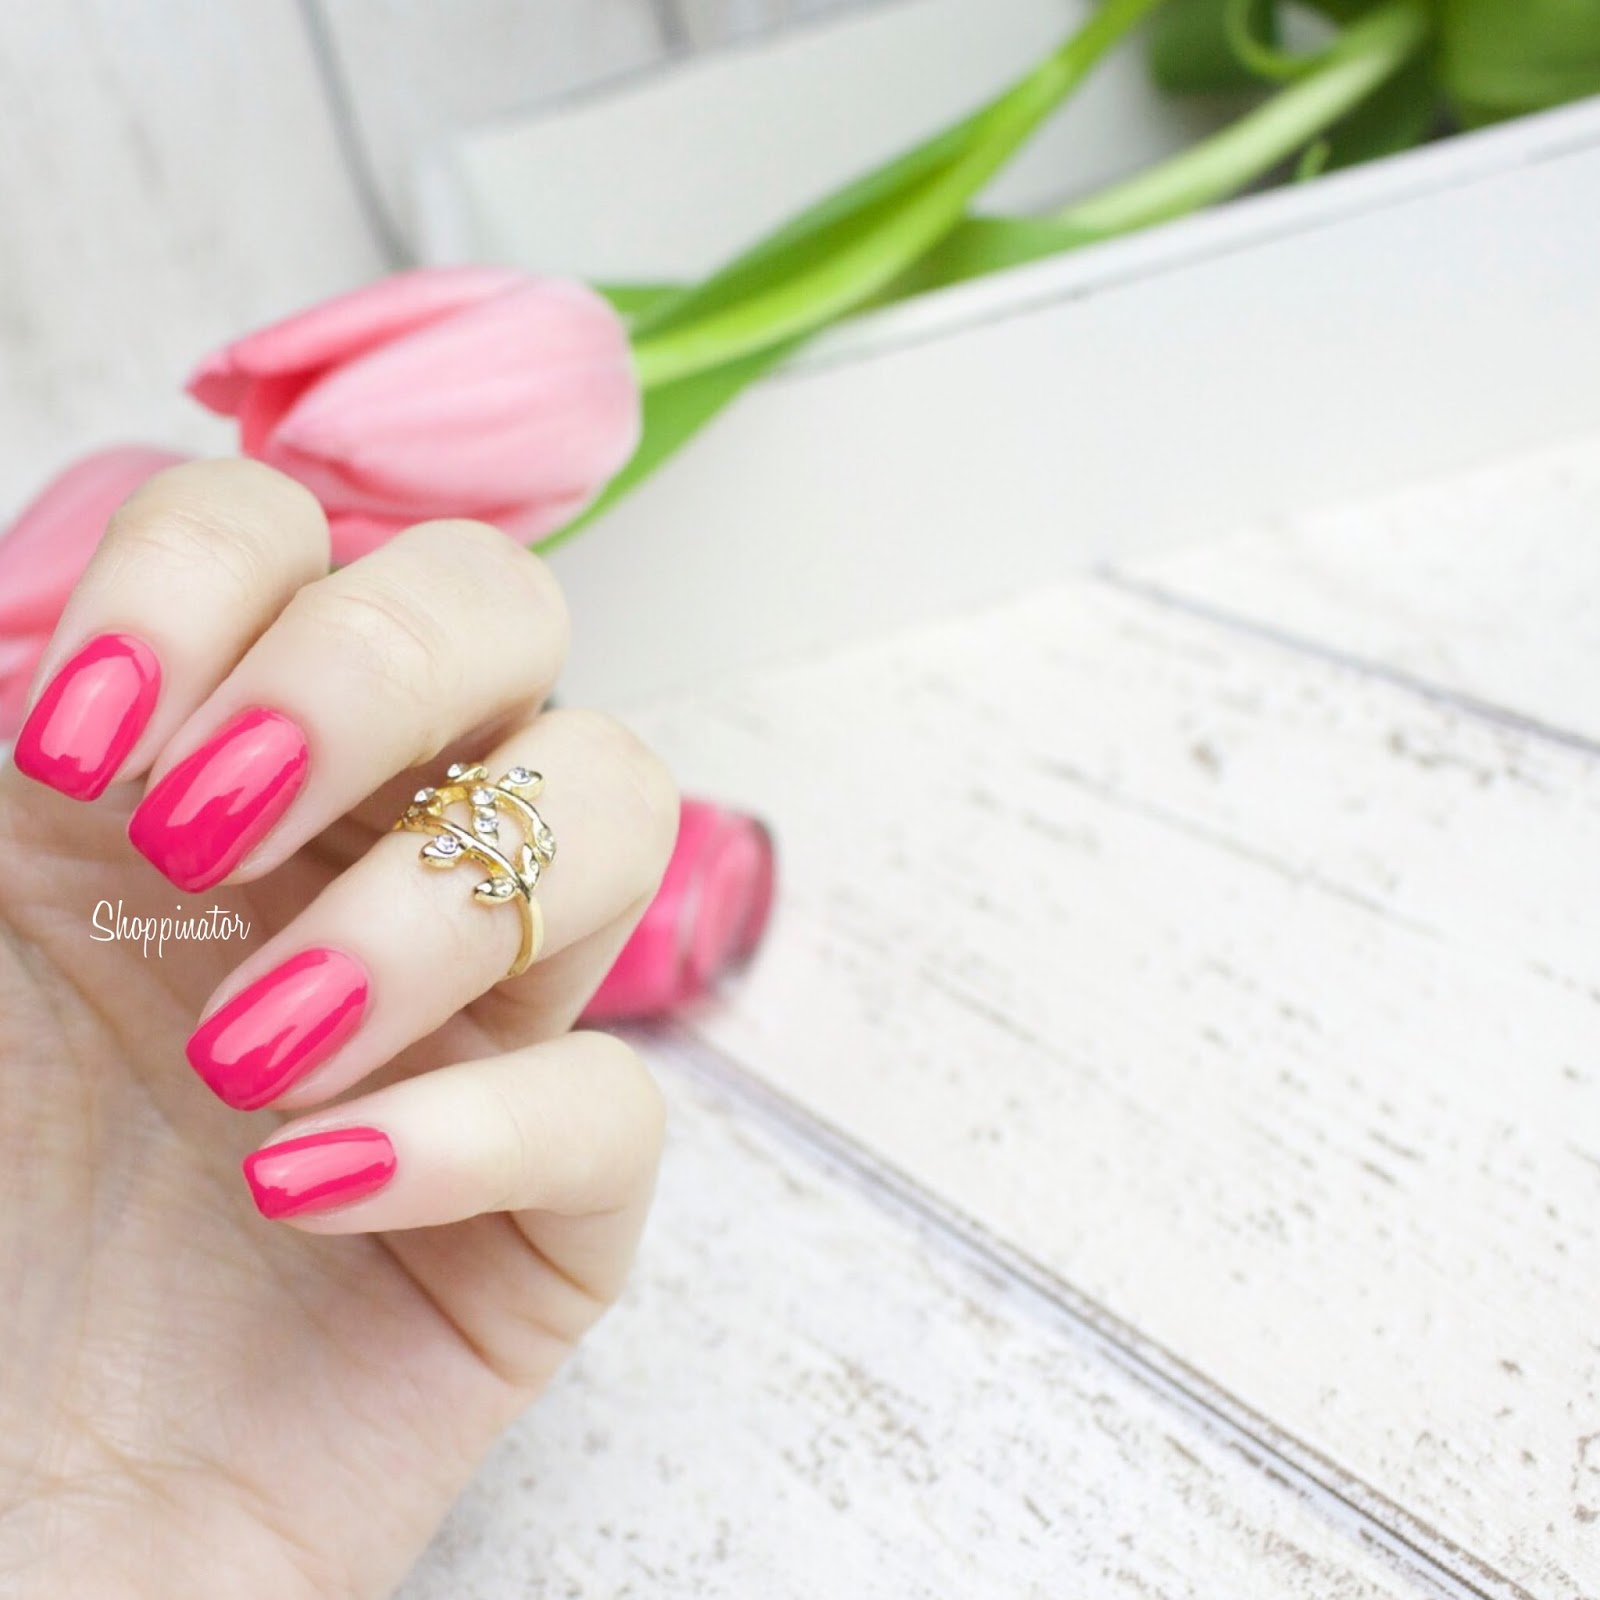 Shoppinator-Astor-Pink-with-envy-Pink-Perfect-Stay-Gel-Shine-Nagellack-Notd-Nails-Frühlingslack-Frühling-Drogerie-Miss-Sophies-Flamingo-Nail-Sticker-Nailsticker-Flamingos-Nailwraps